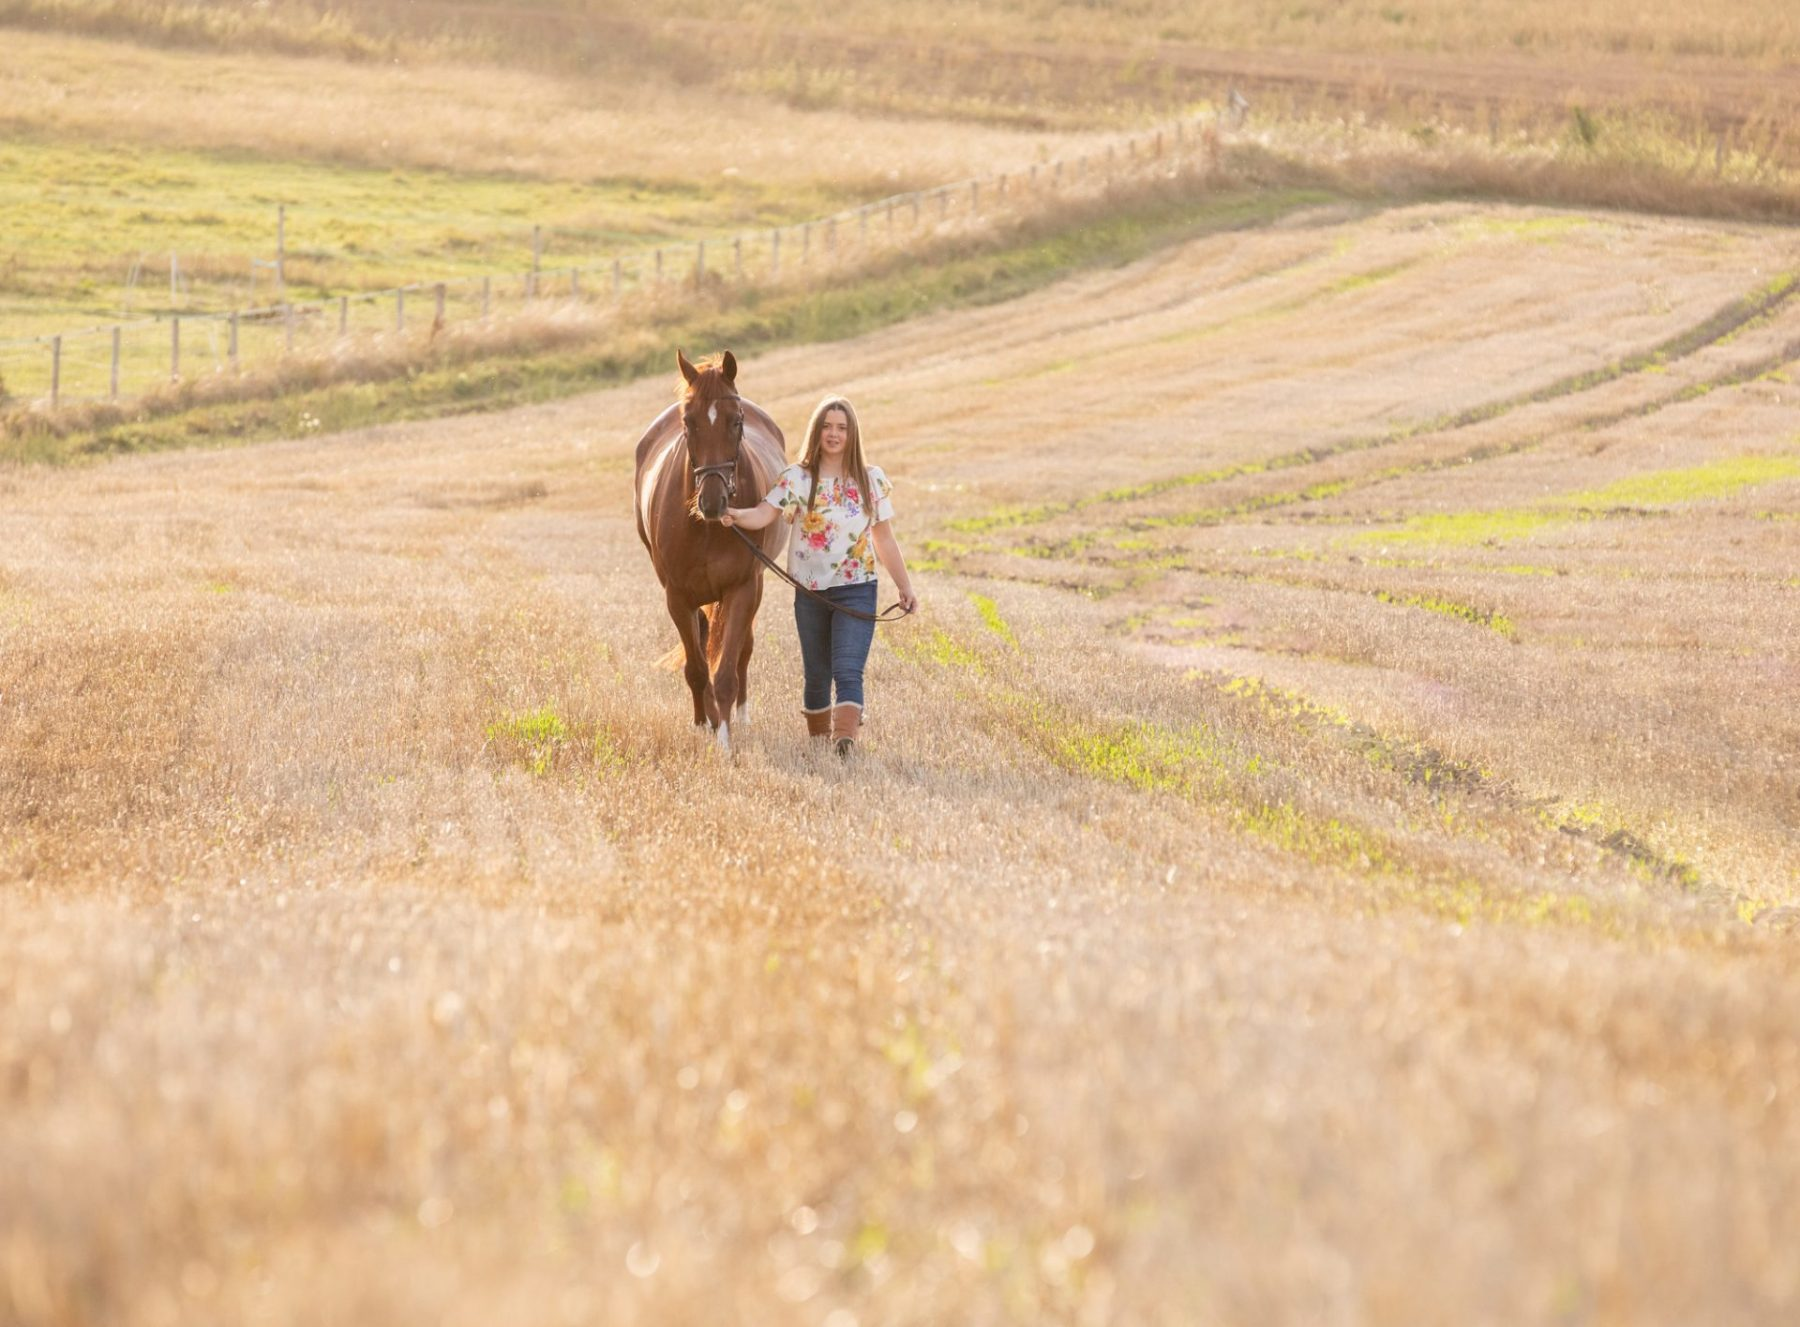 wiltshire horse photoshoots